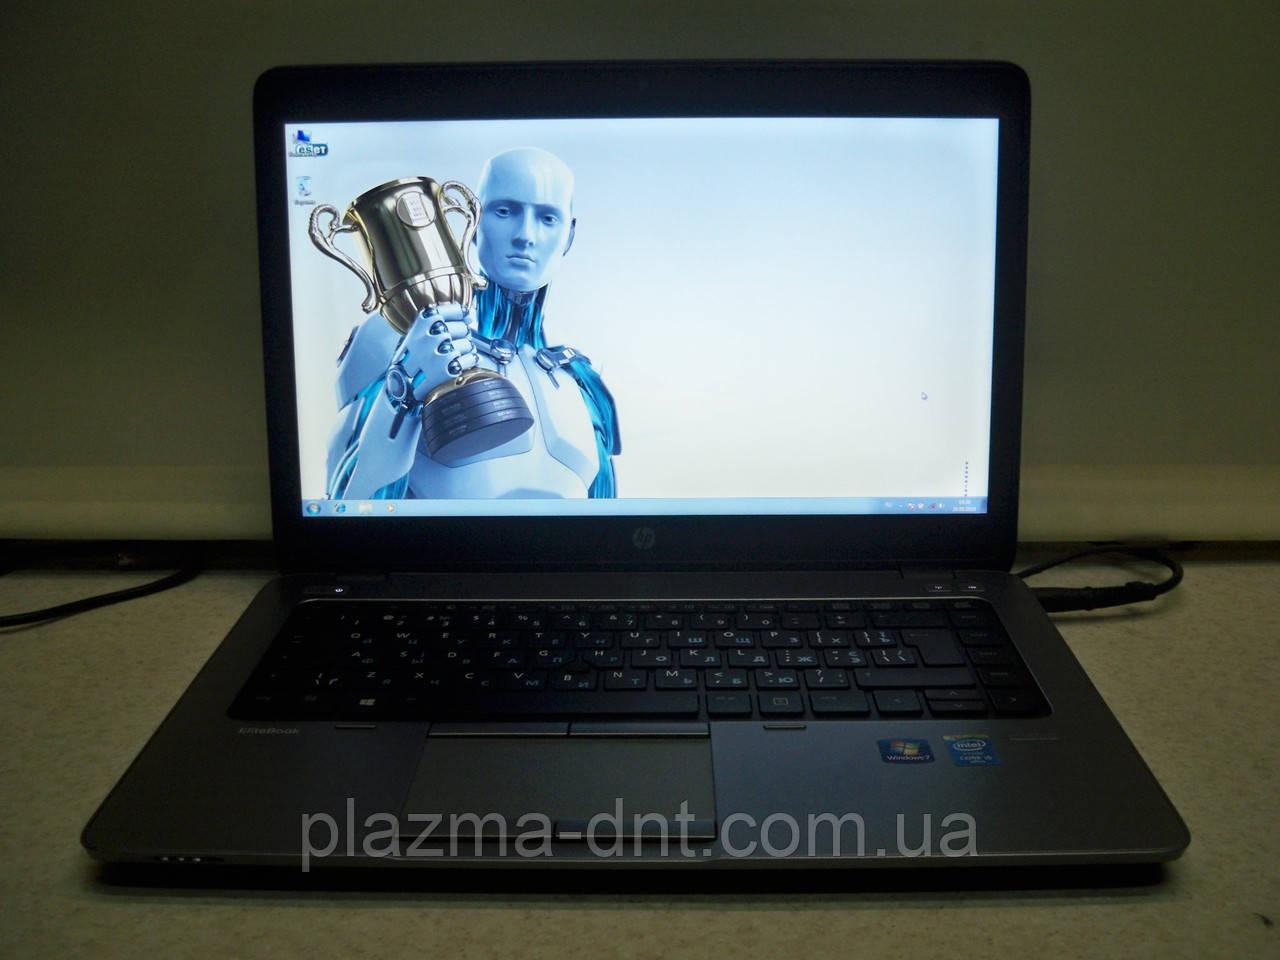 Ноутбук HP EliteBook 840 G1 /i5-4300U/RAM 8GB/SSD/INT VIDEO 1GB БУ